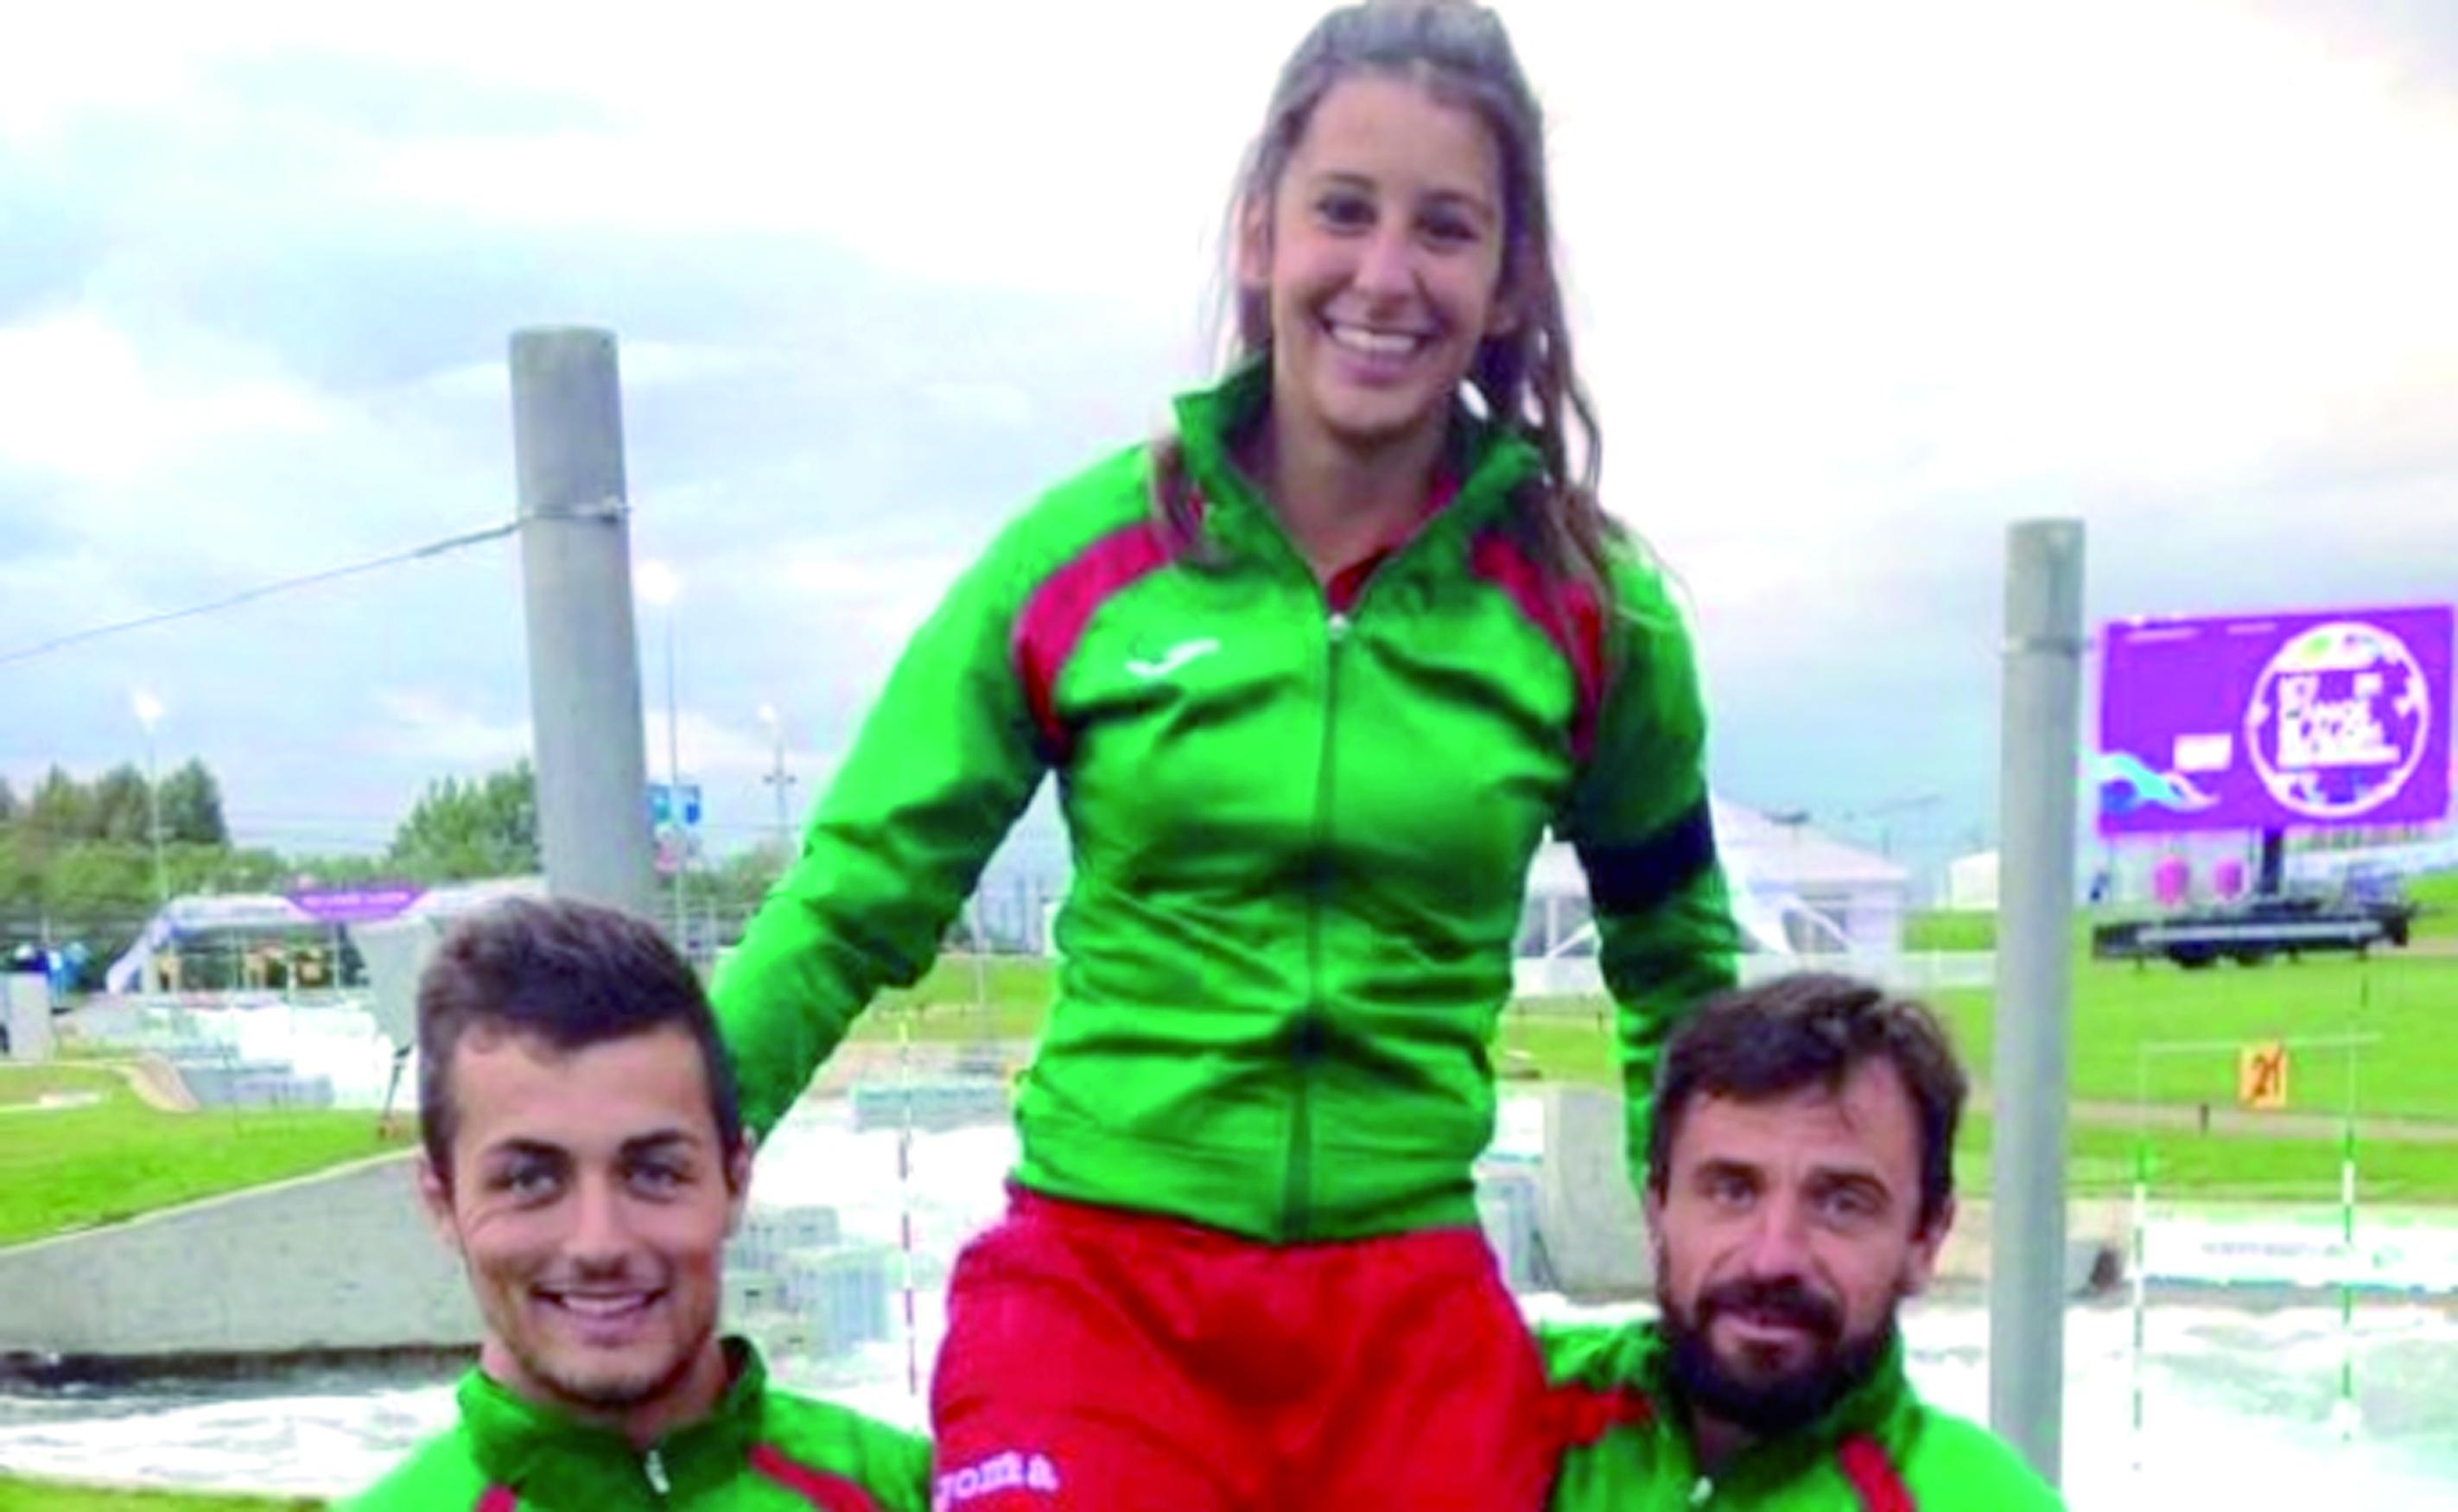 Hind Jamili vise une bonne prestation en canoe-kayak aux JO